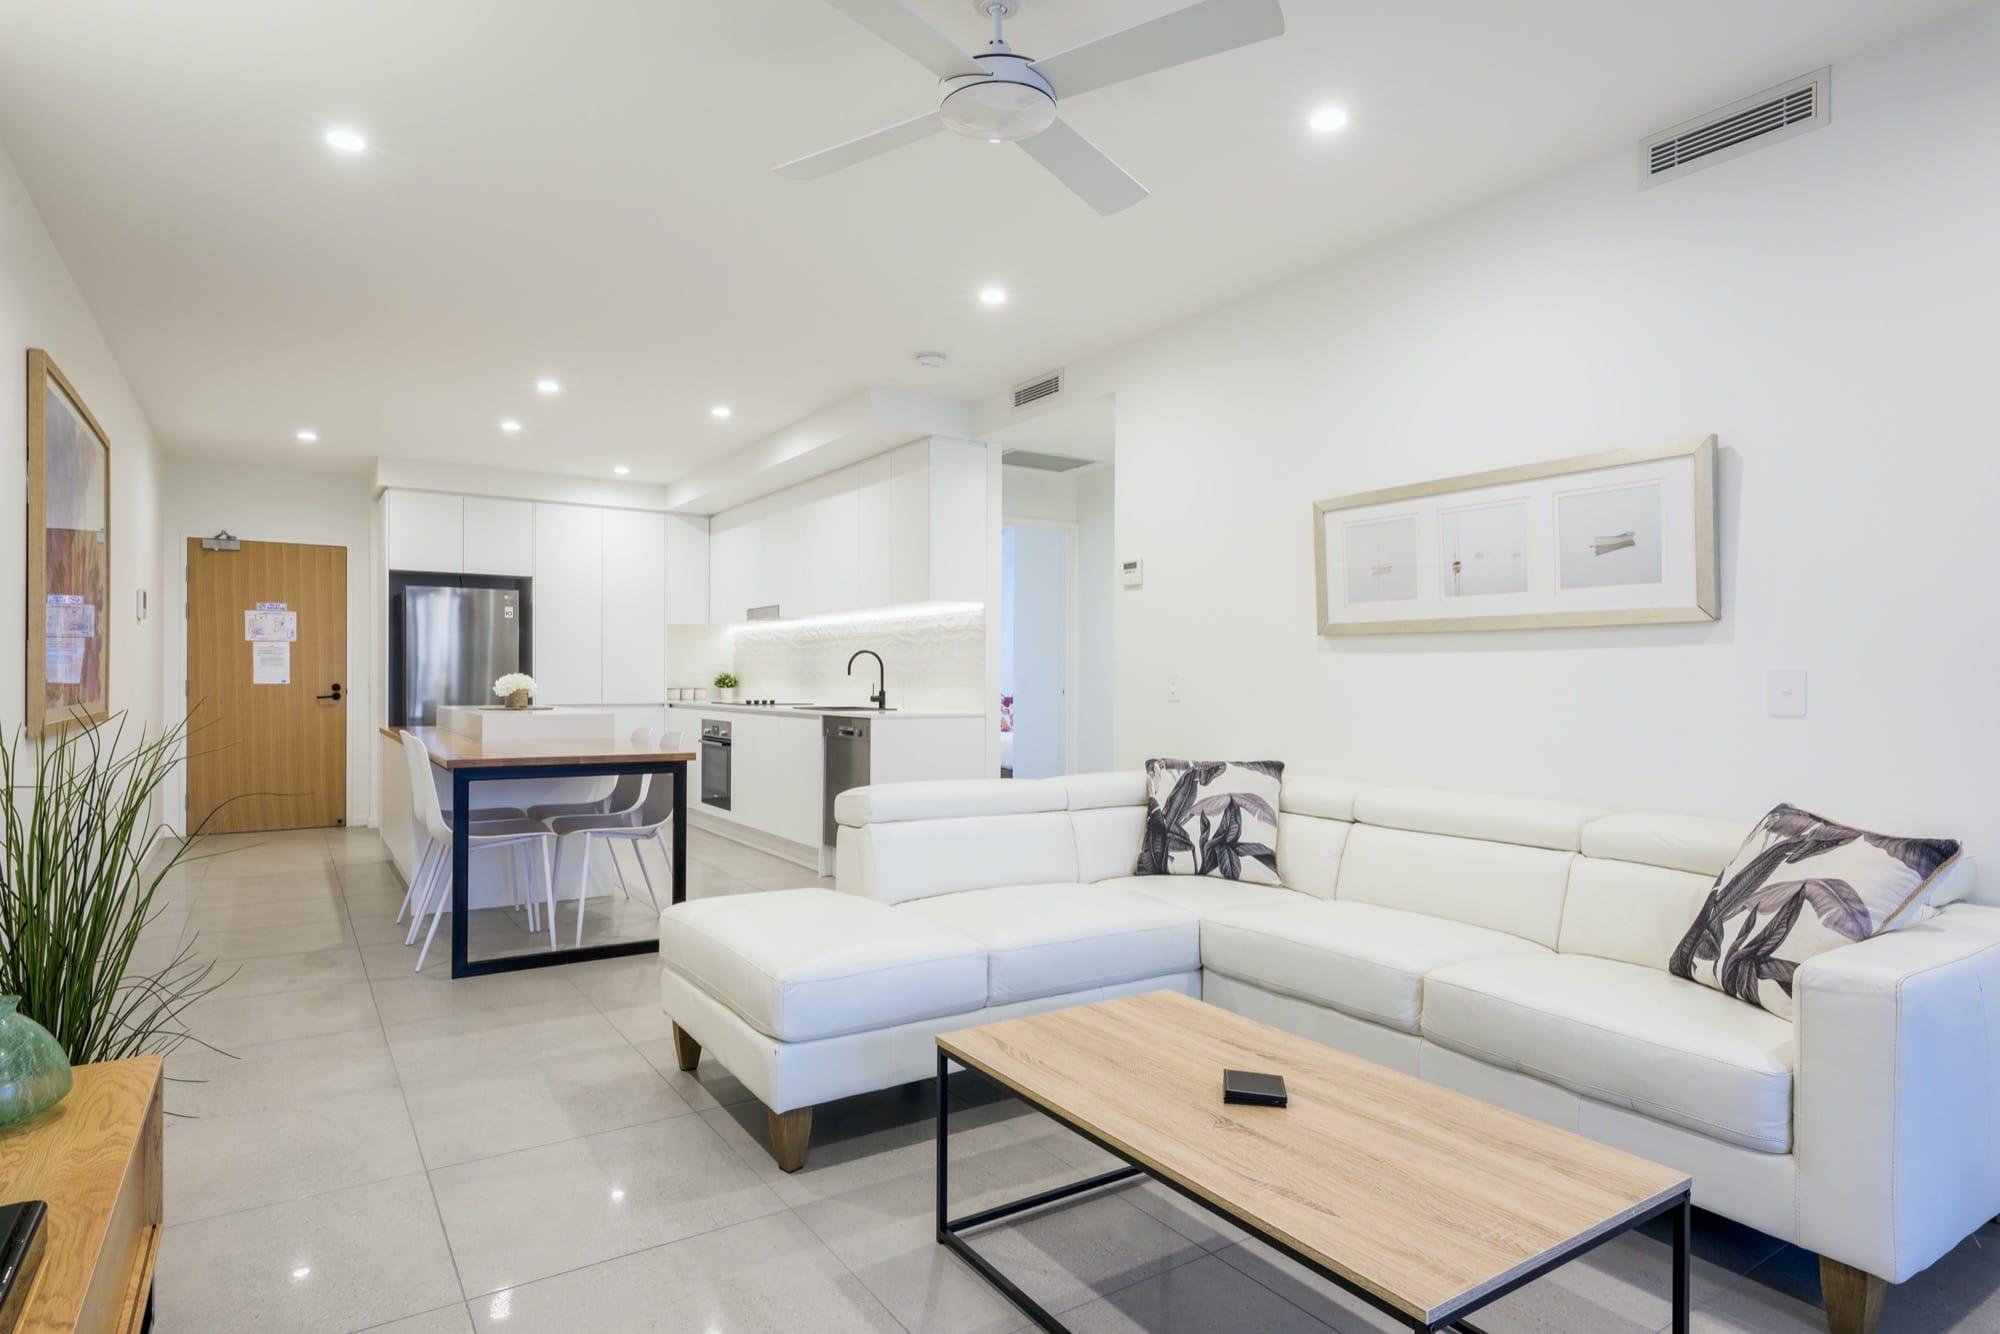 unit-501-living-dining-kitchen-3